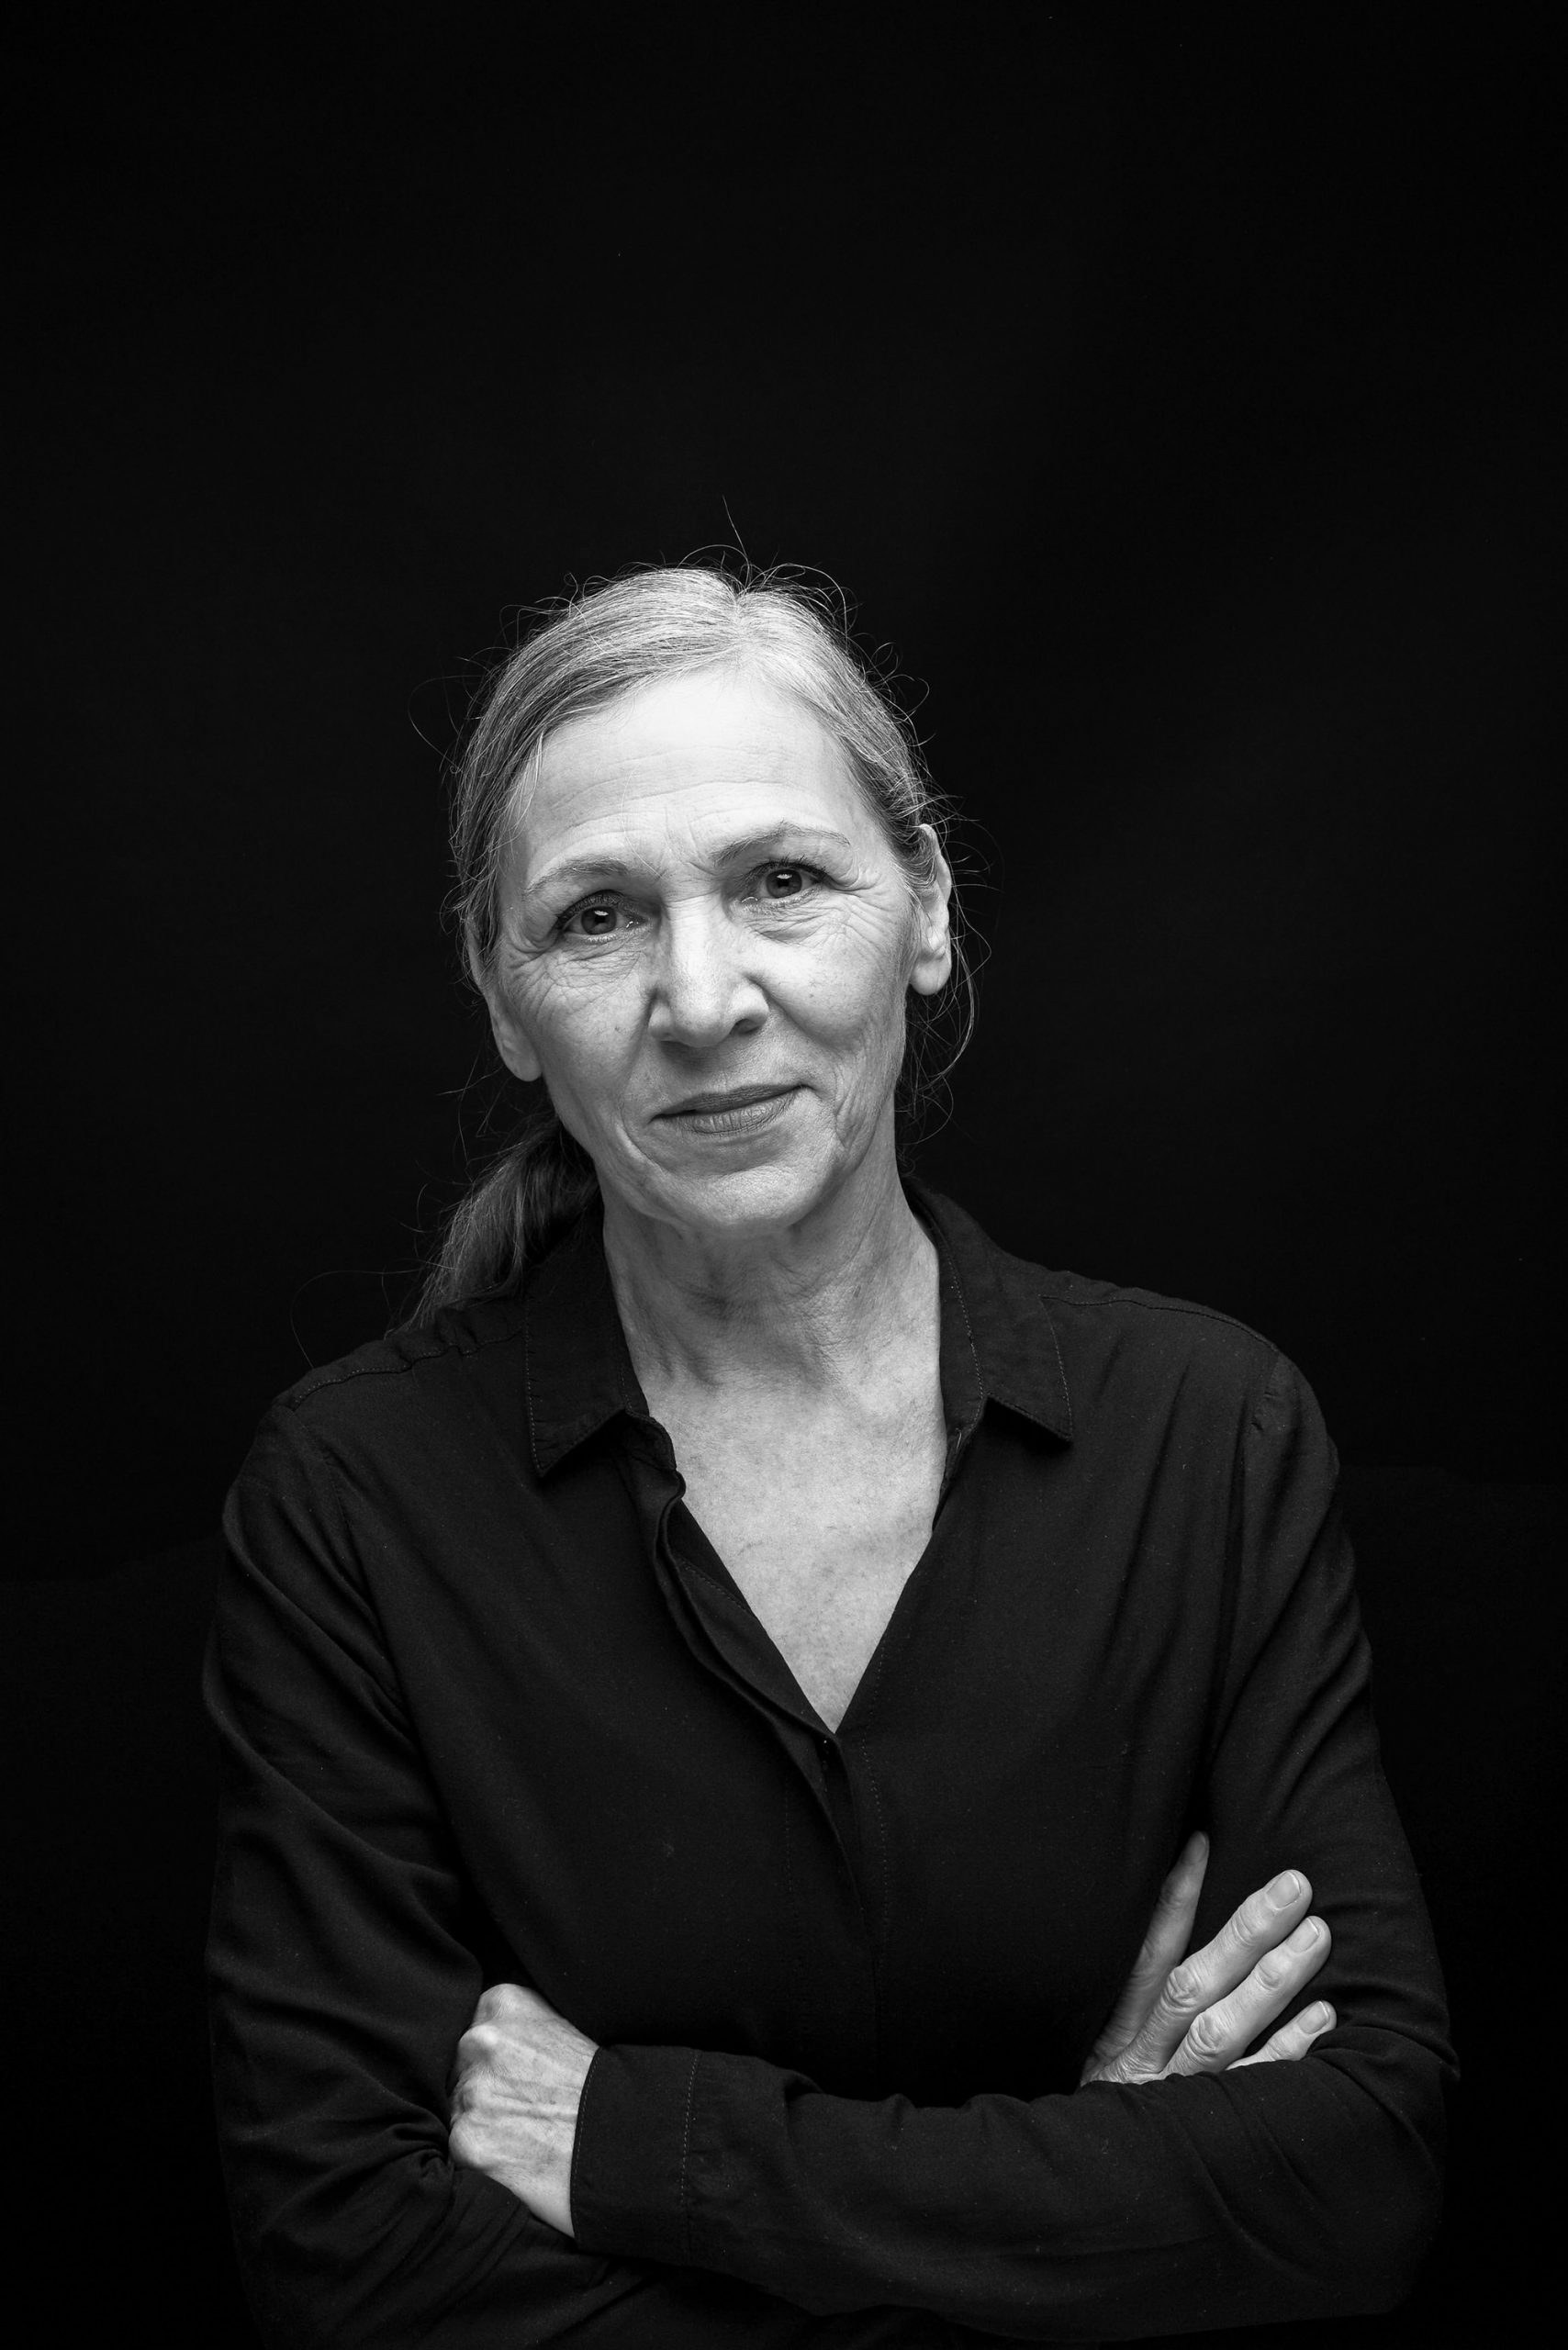 Brunhild Breuer